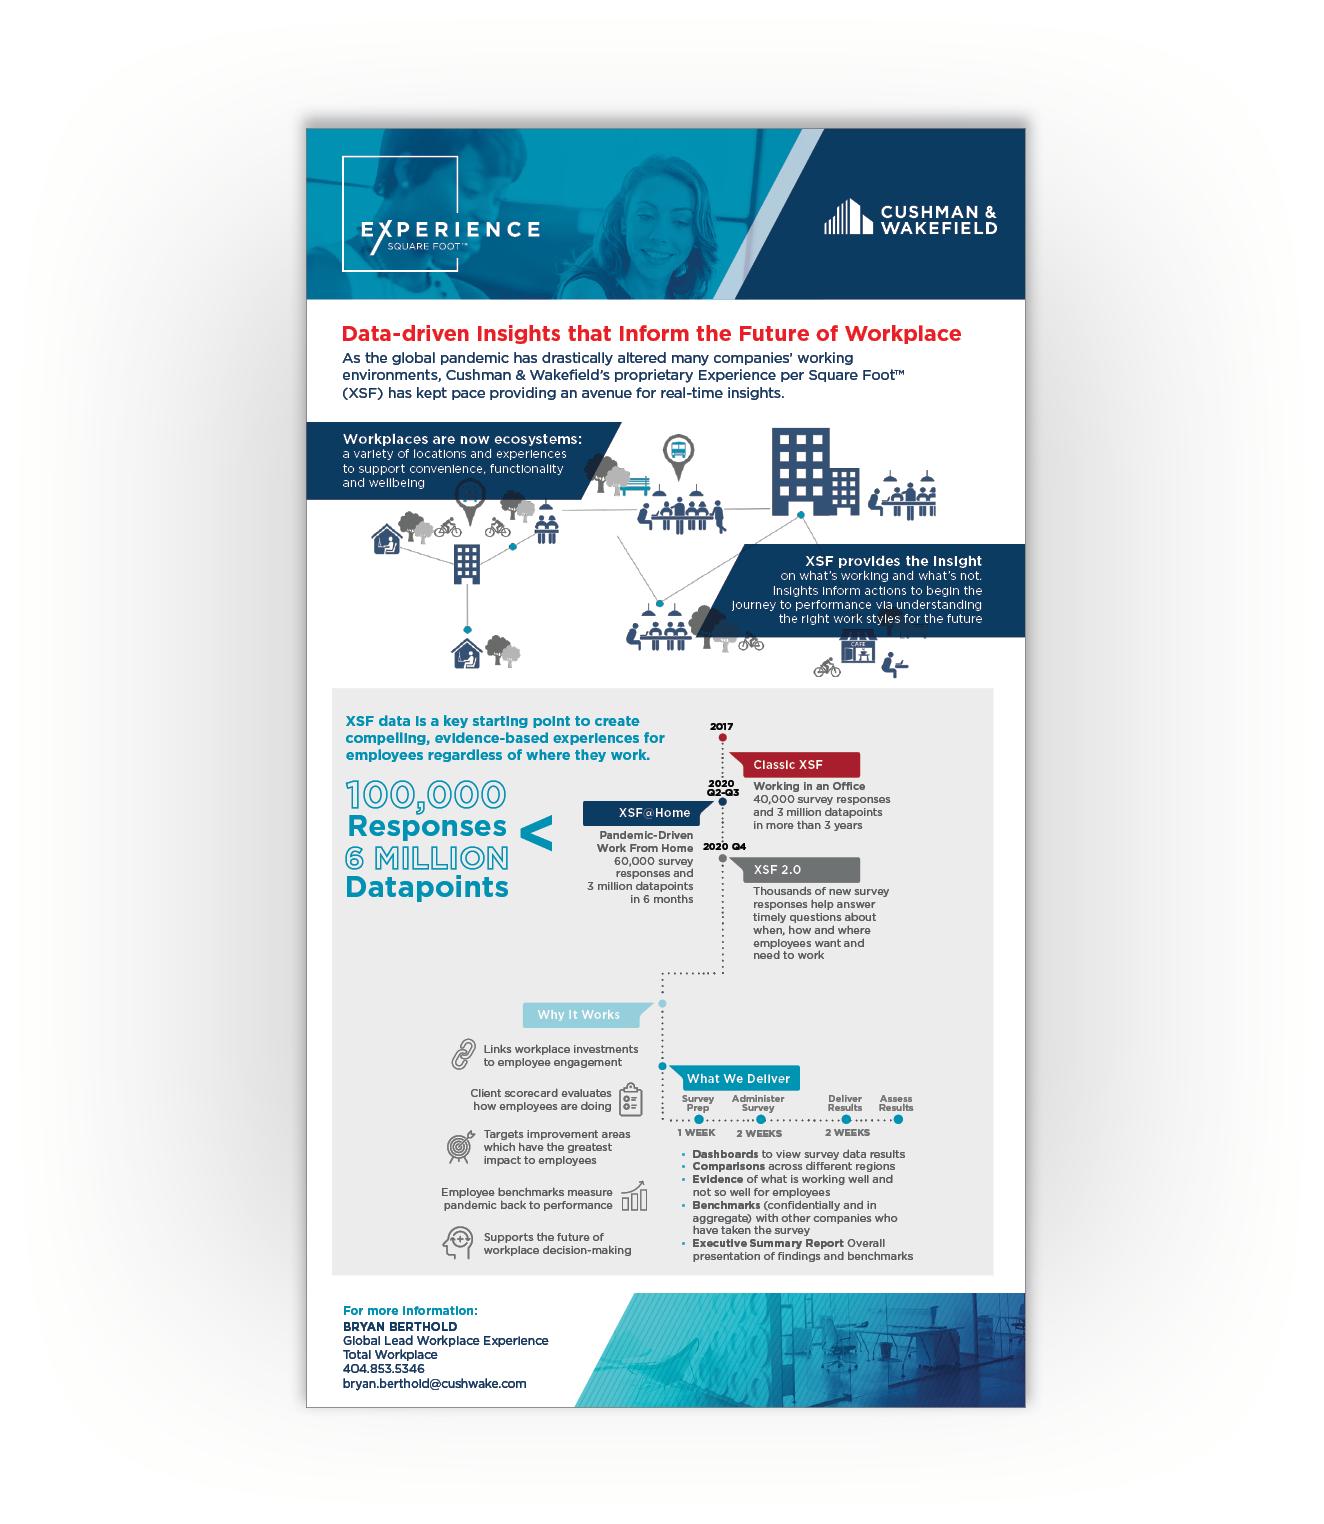 XSF 2.0 Infographic (image)